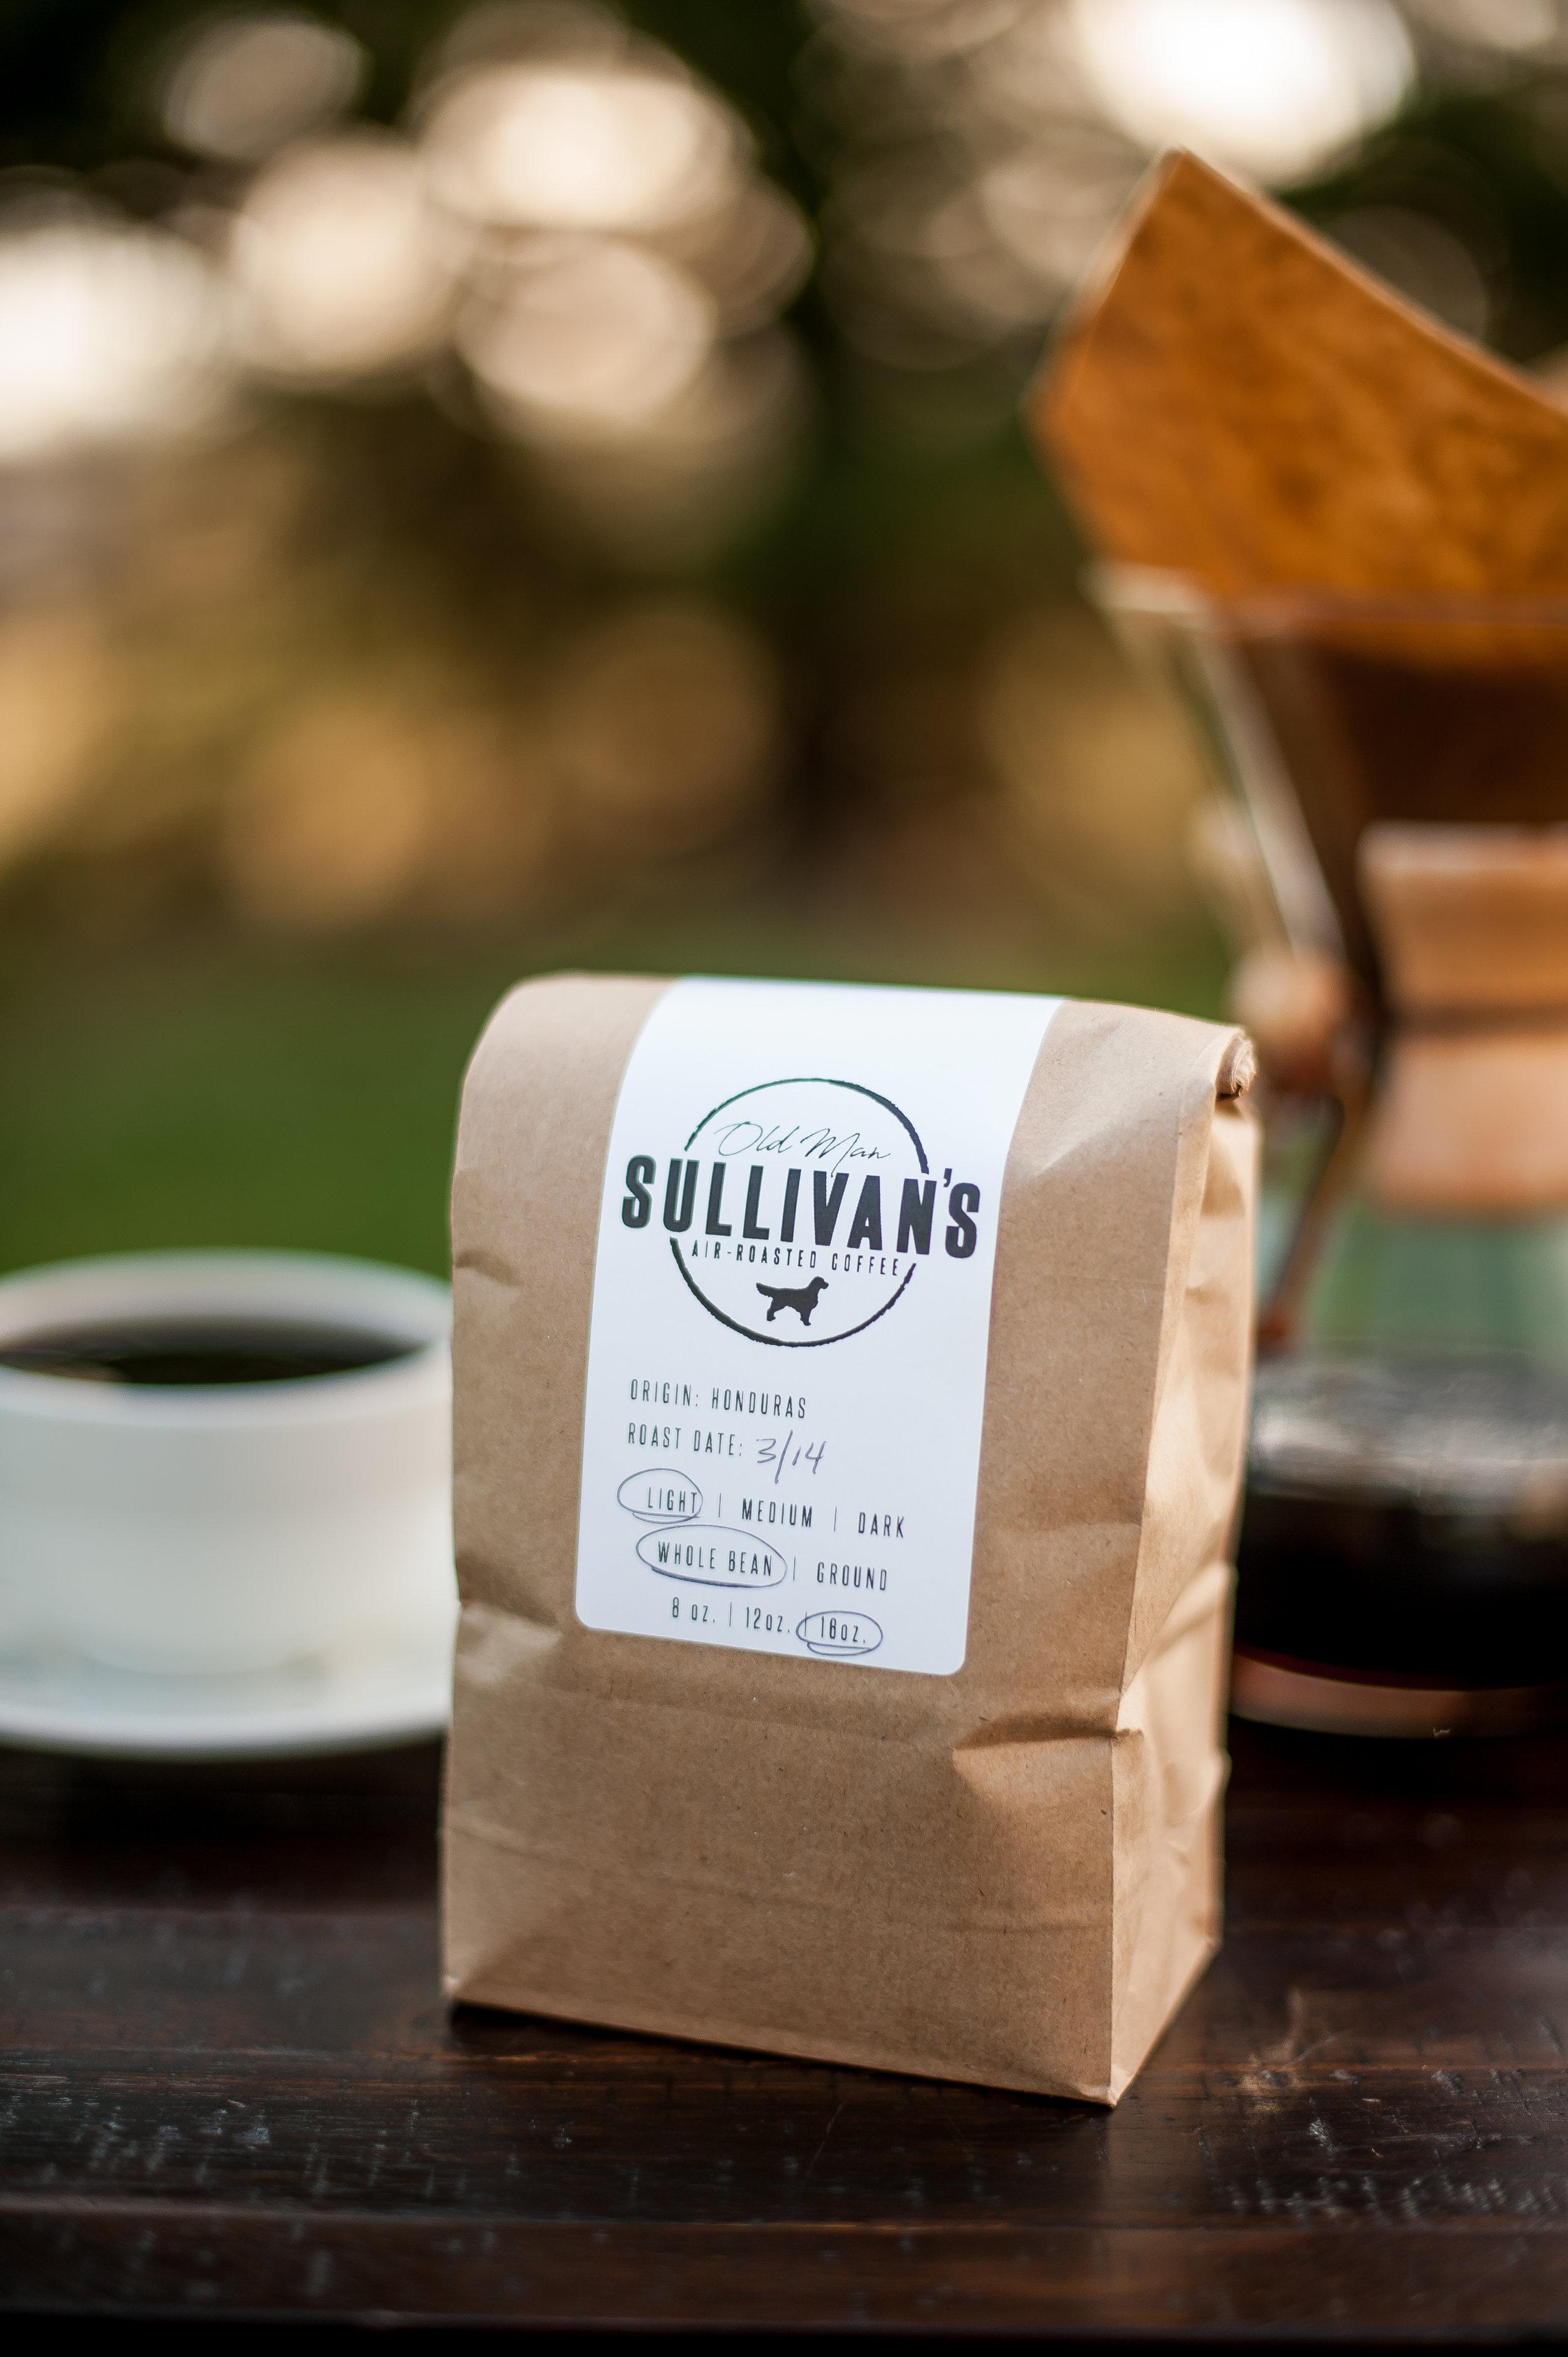 old_man_sullivans_coffee_co_jtp2019-7.jpg